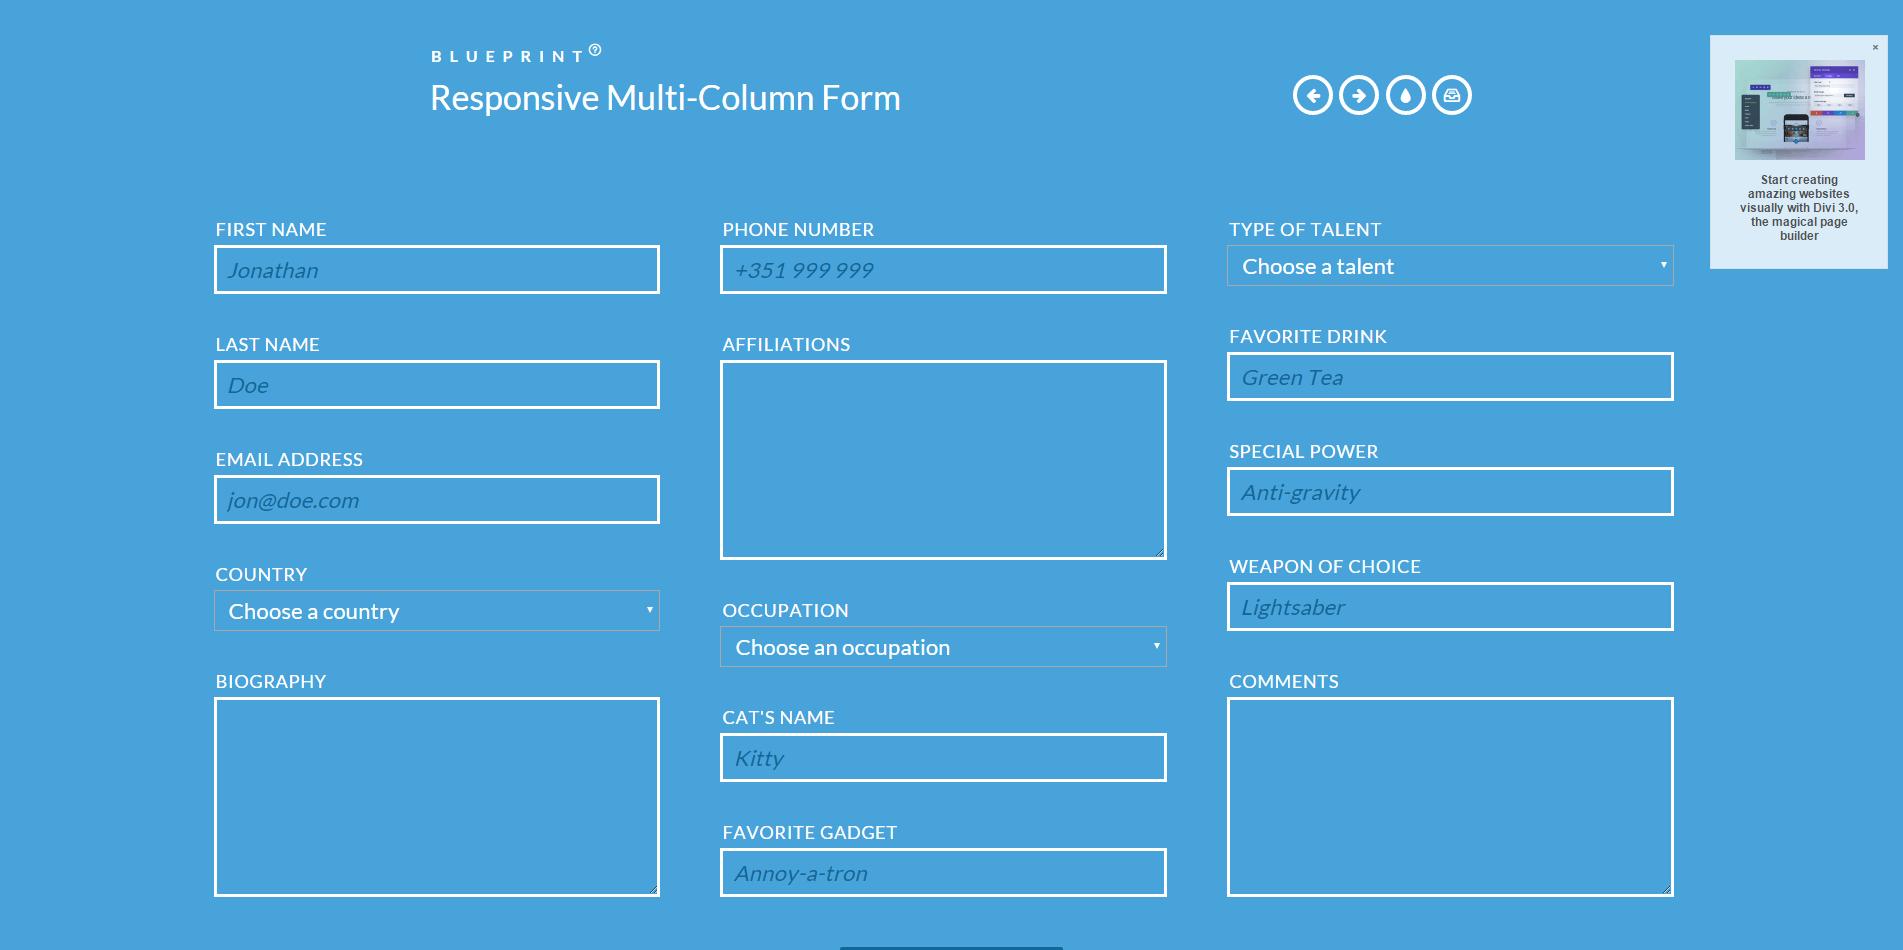 响应式多列表单-Responsive Multi-Column Form